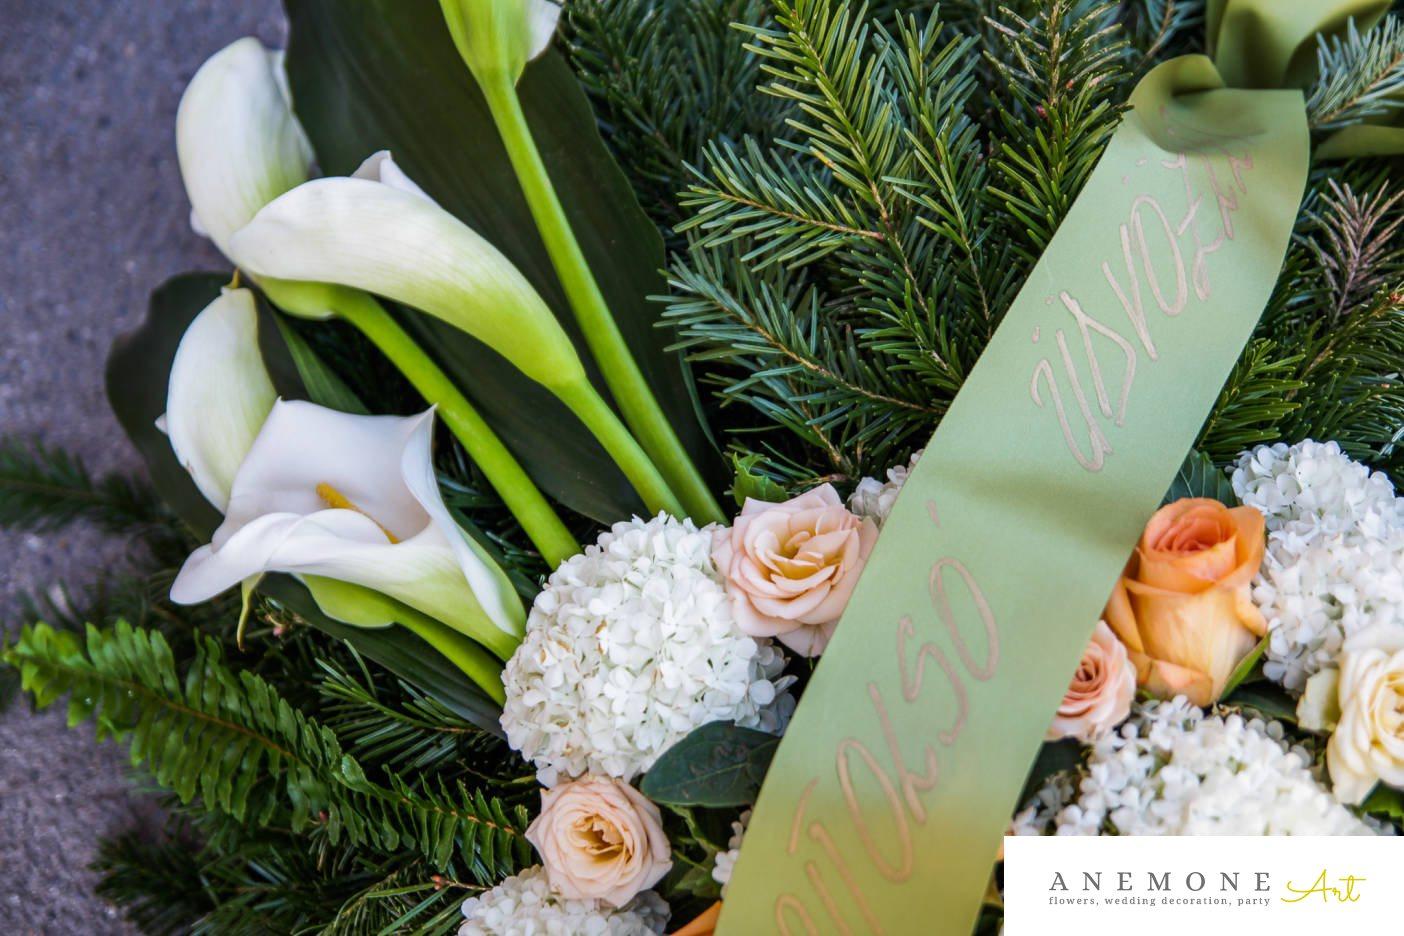 Poza, foto cu Flori de nunta alb, calla, coroana funerara, hortensia, piersica, trandafiri in Arad, Timisoara, Oradea (wedding flowers, bouquets) nunta Arad, Timisoara, Oradea